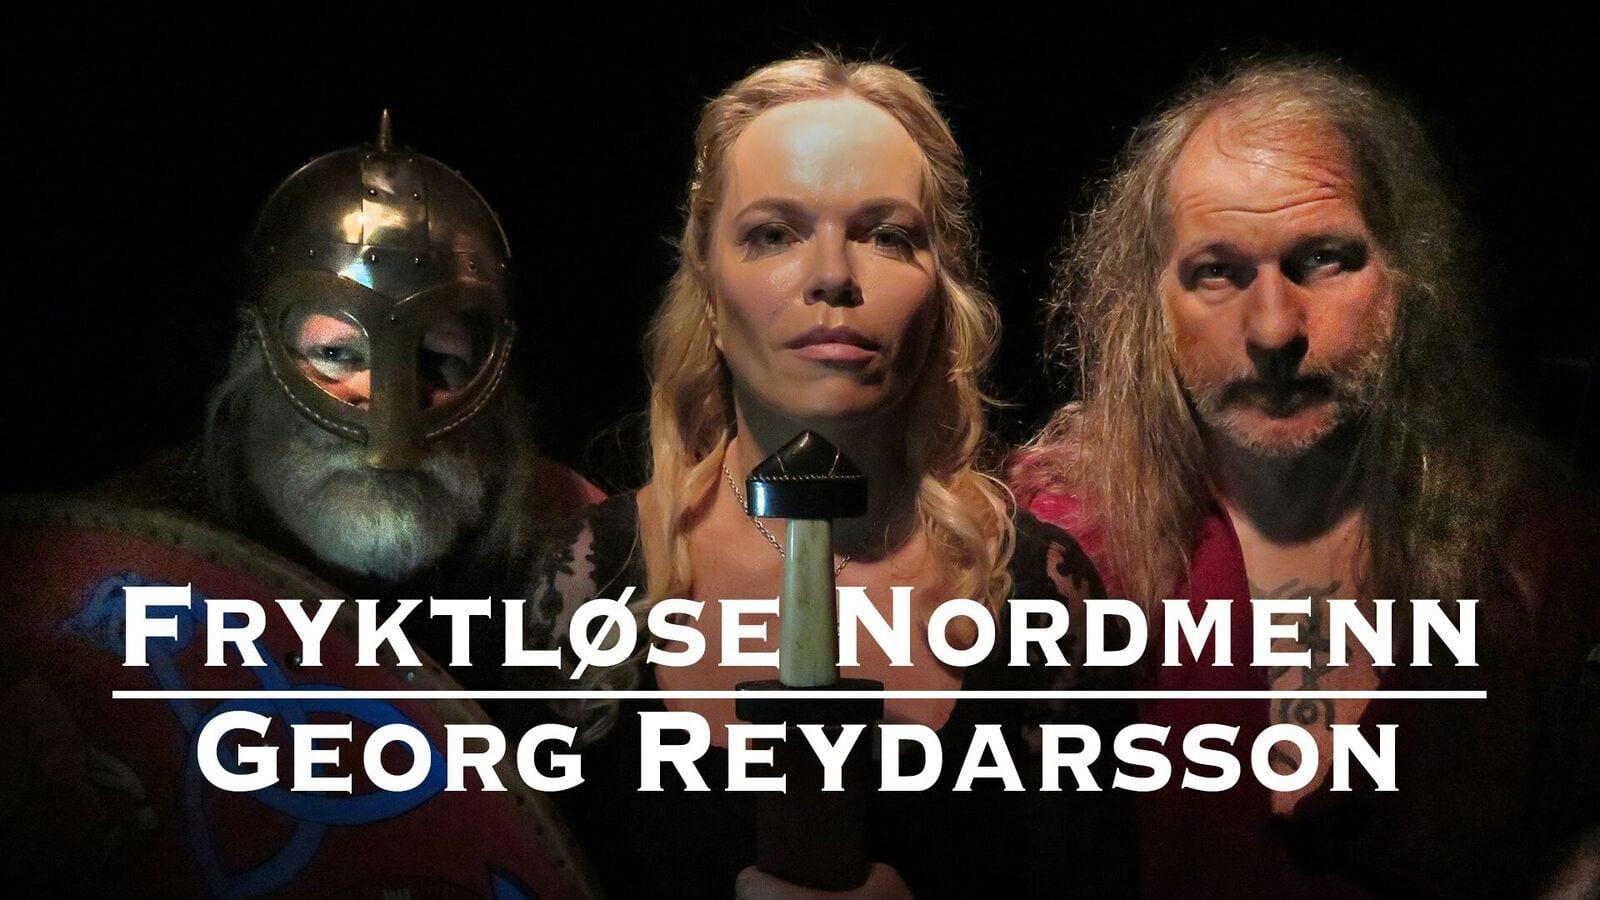 Fryktløse Nordmenn Georg Reydarsson